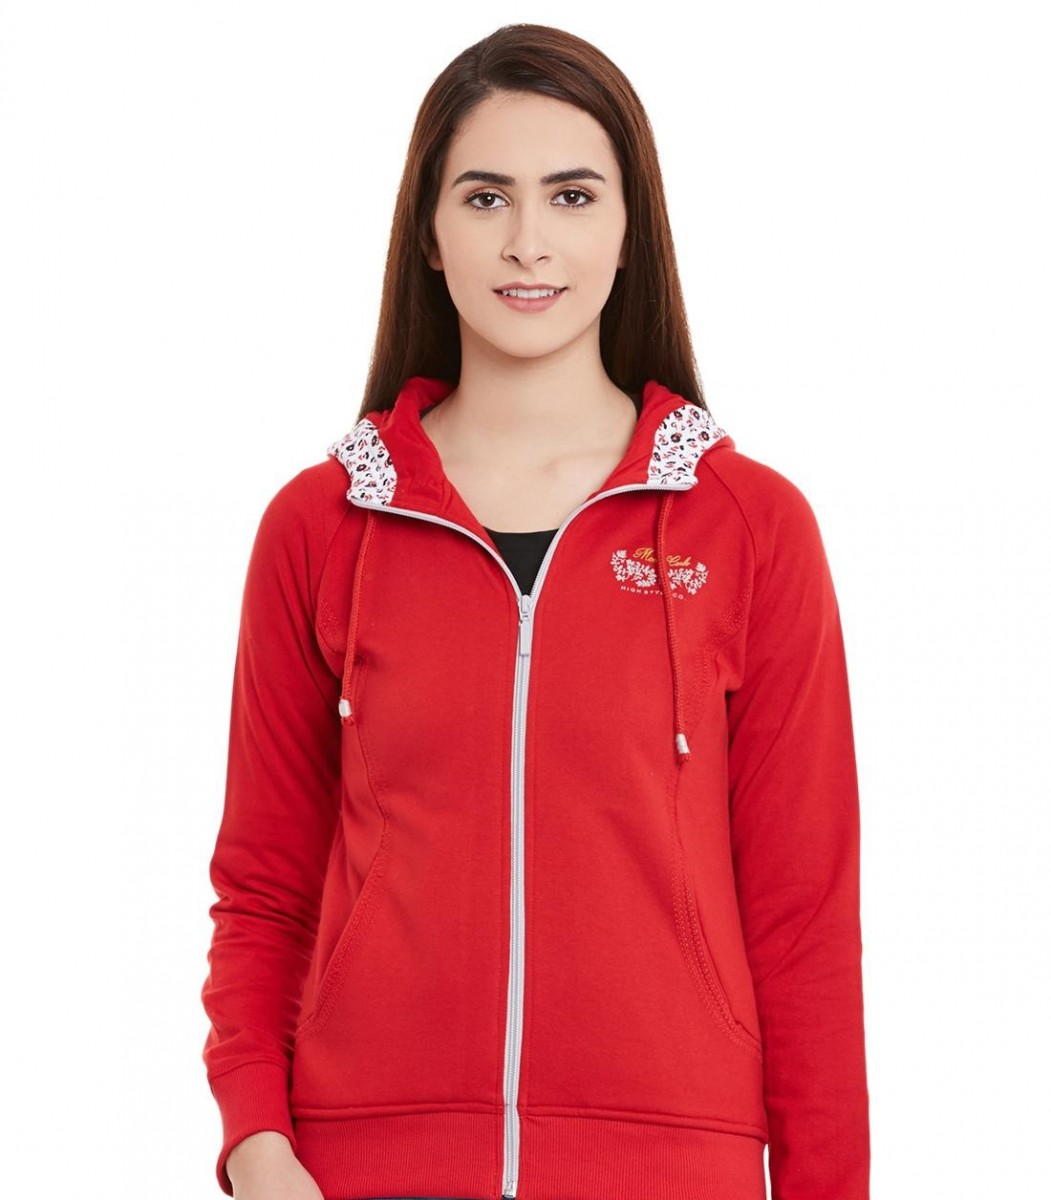 Monte Carlo Winter red printed sweatshirt for ladies